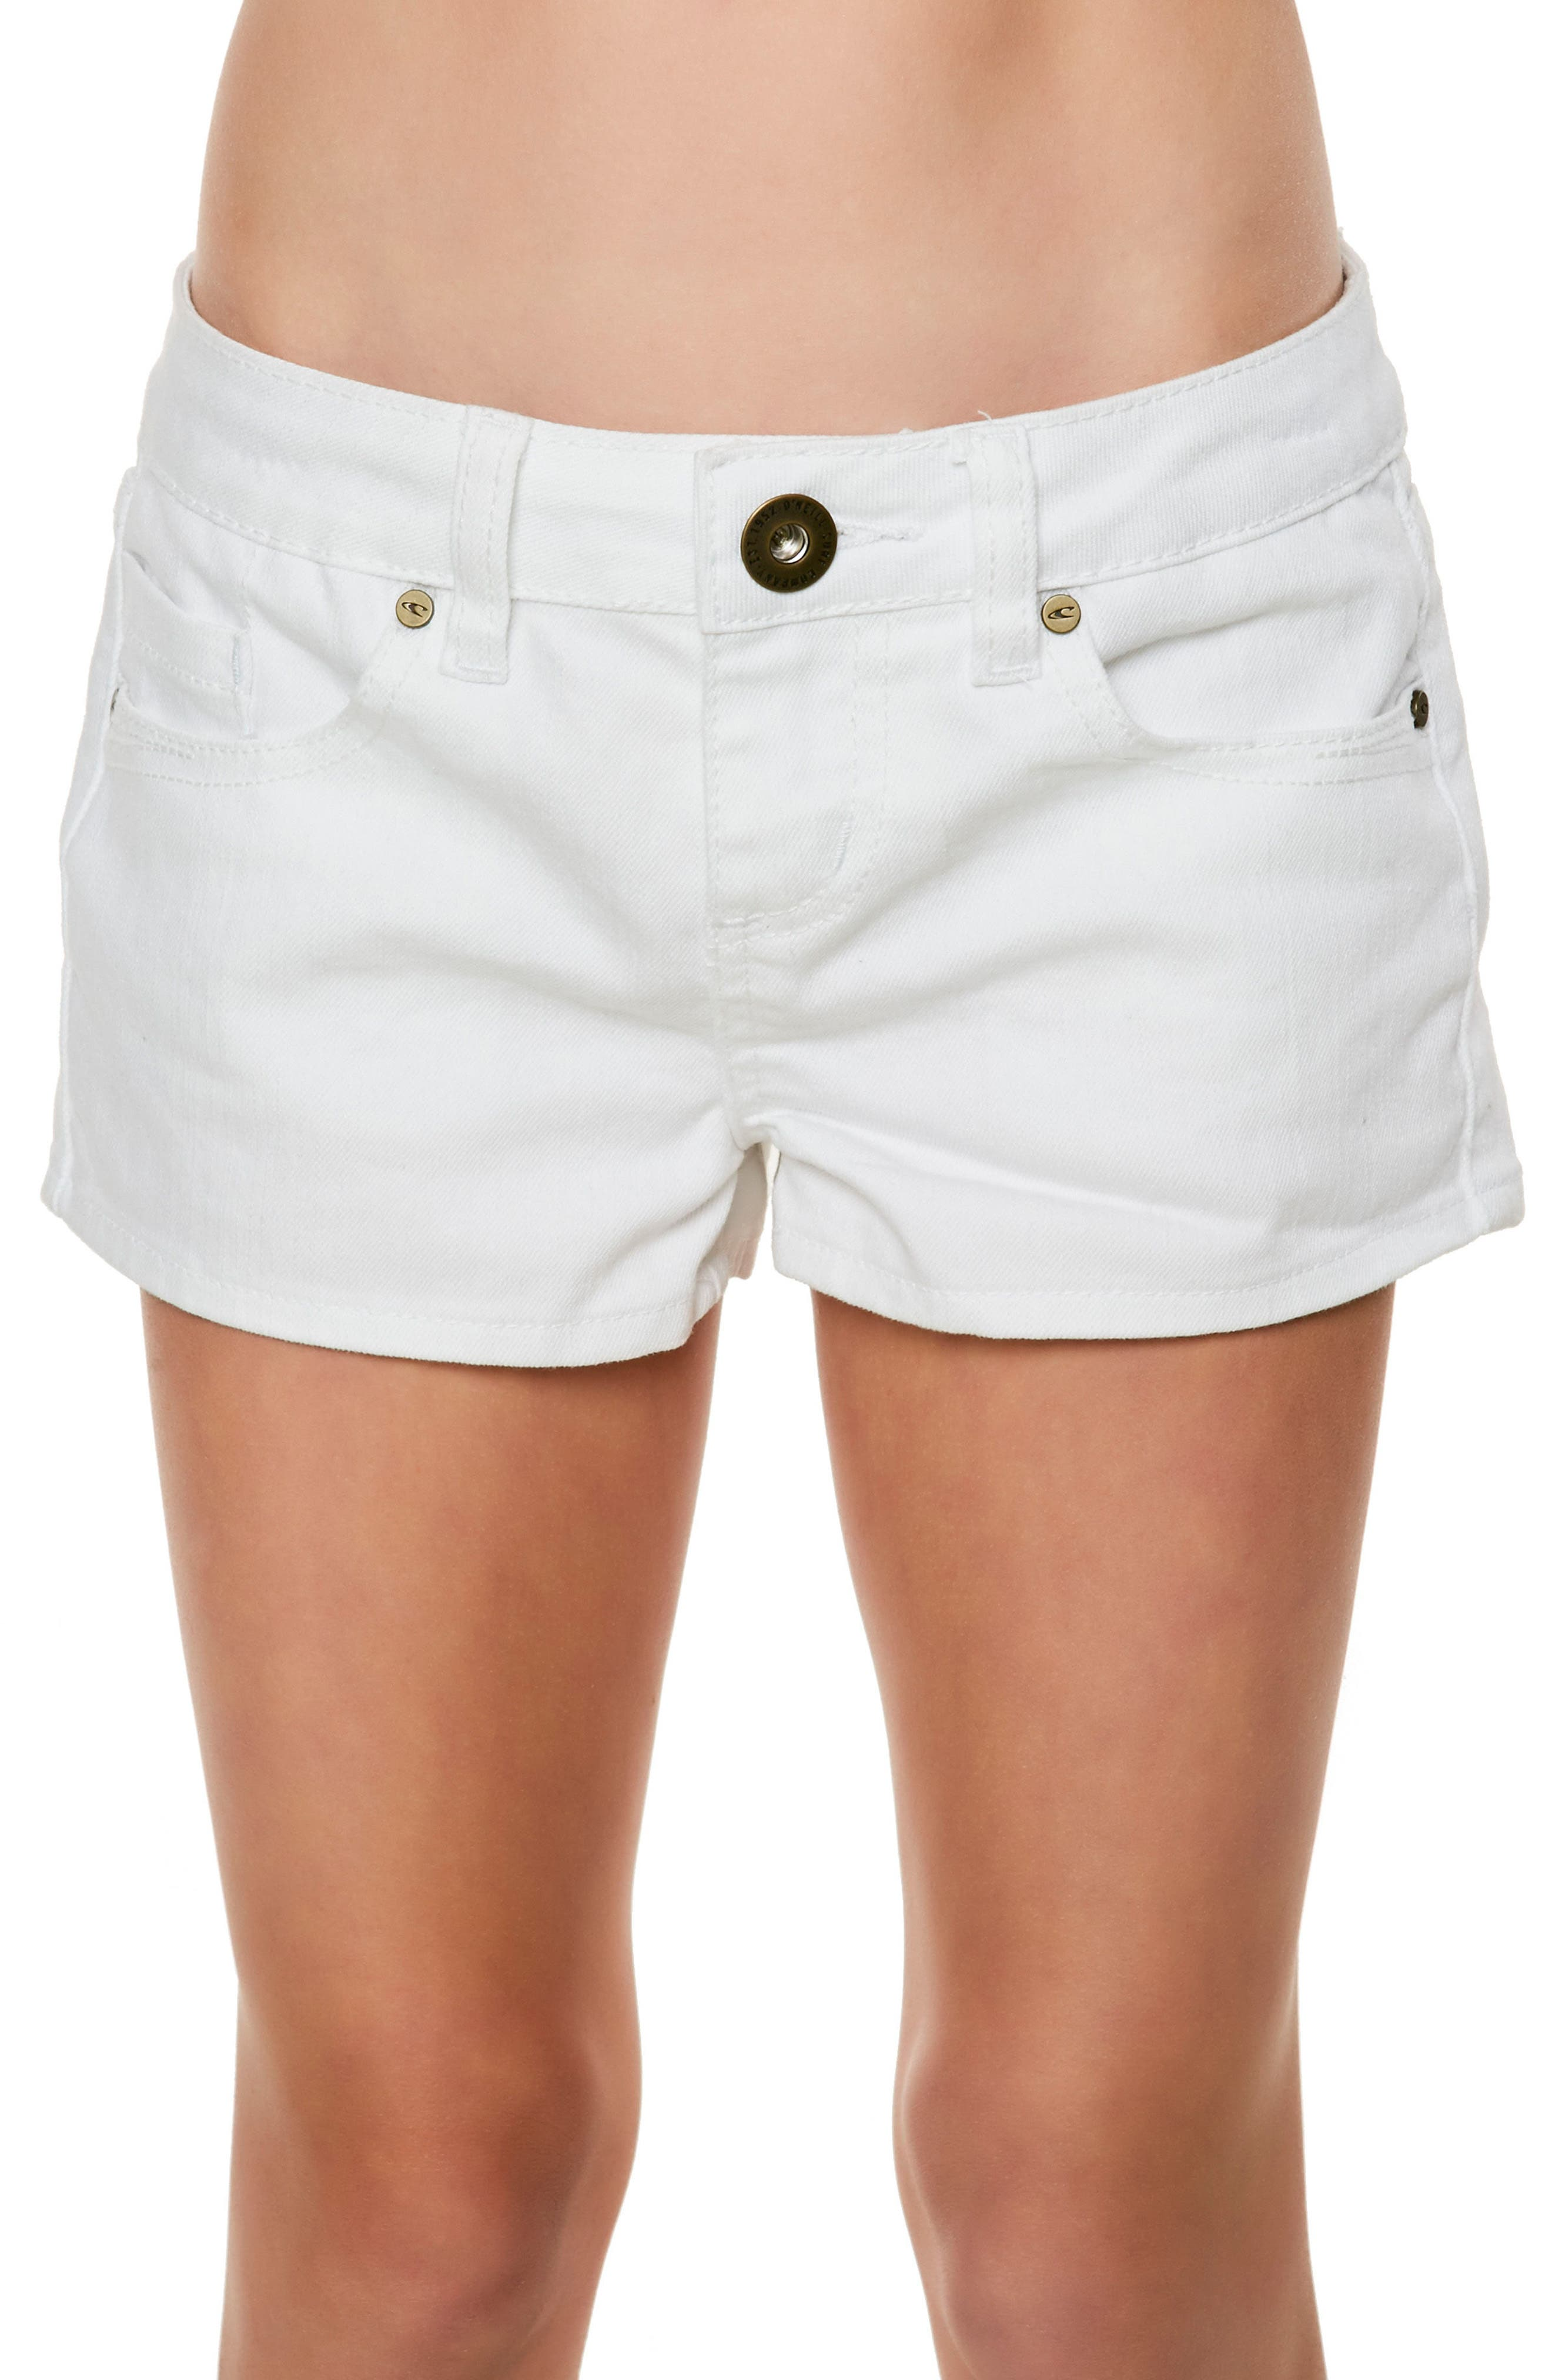 Waidley Denim Shorts,                             Alternate thumbnail 2, color,                             100